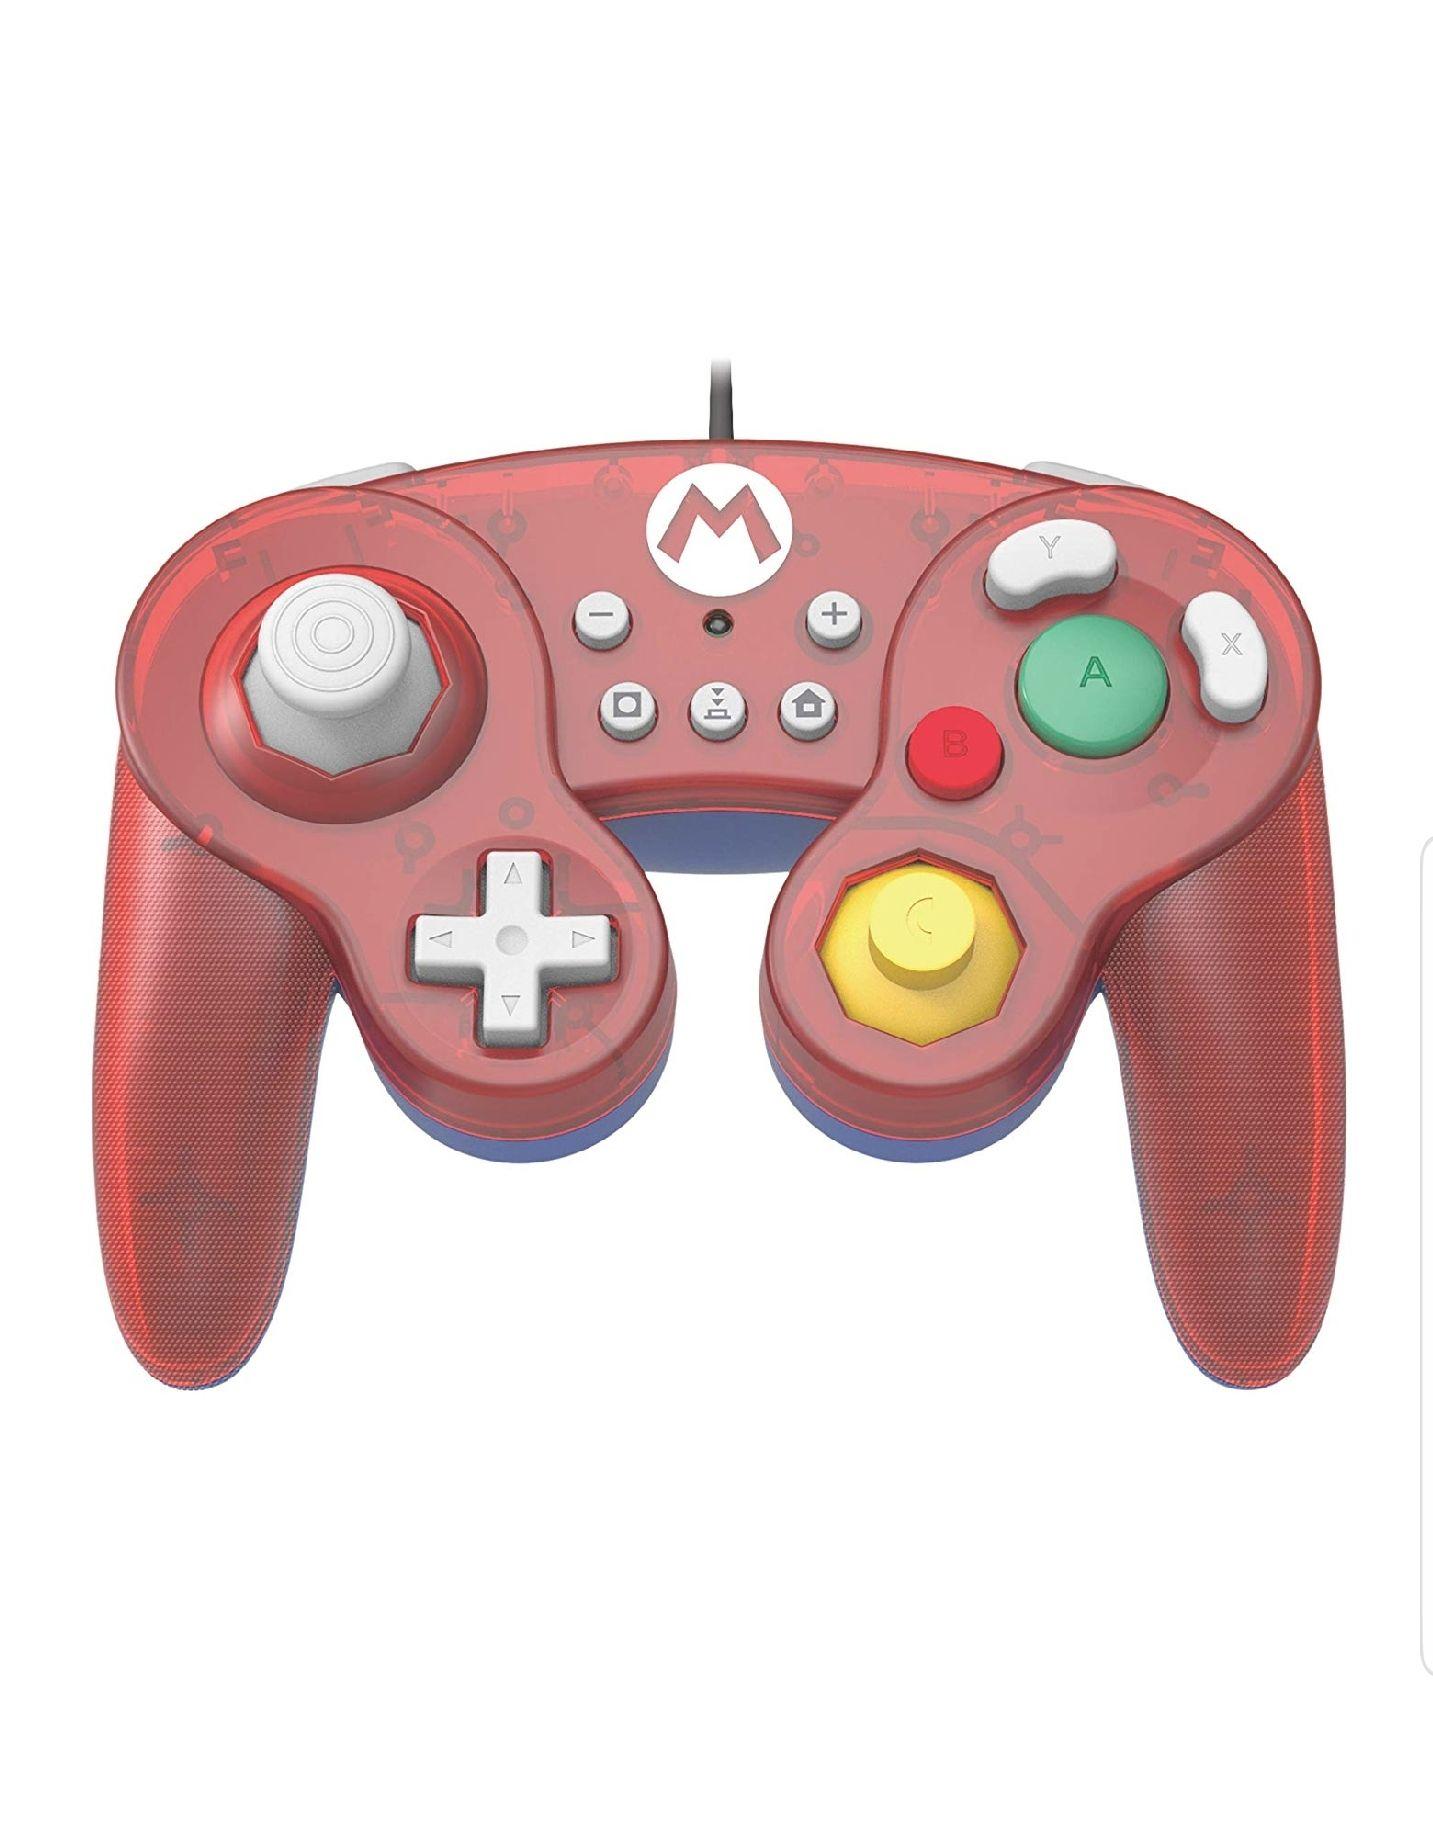 Manette filaire Hori Battle Pad (Mario) pour Switch